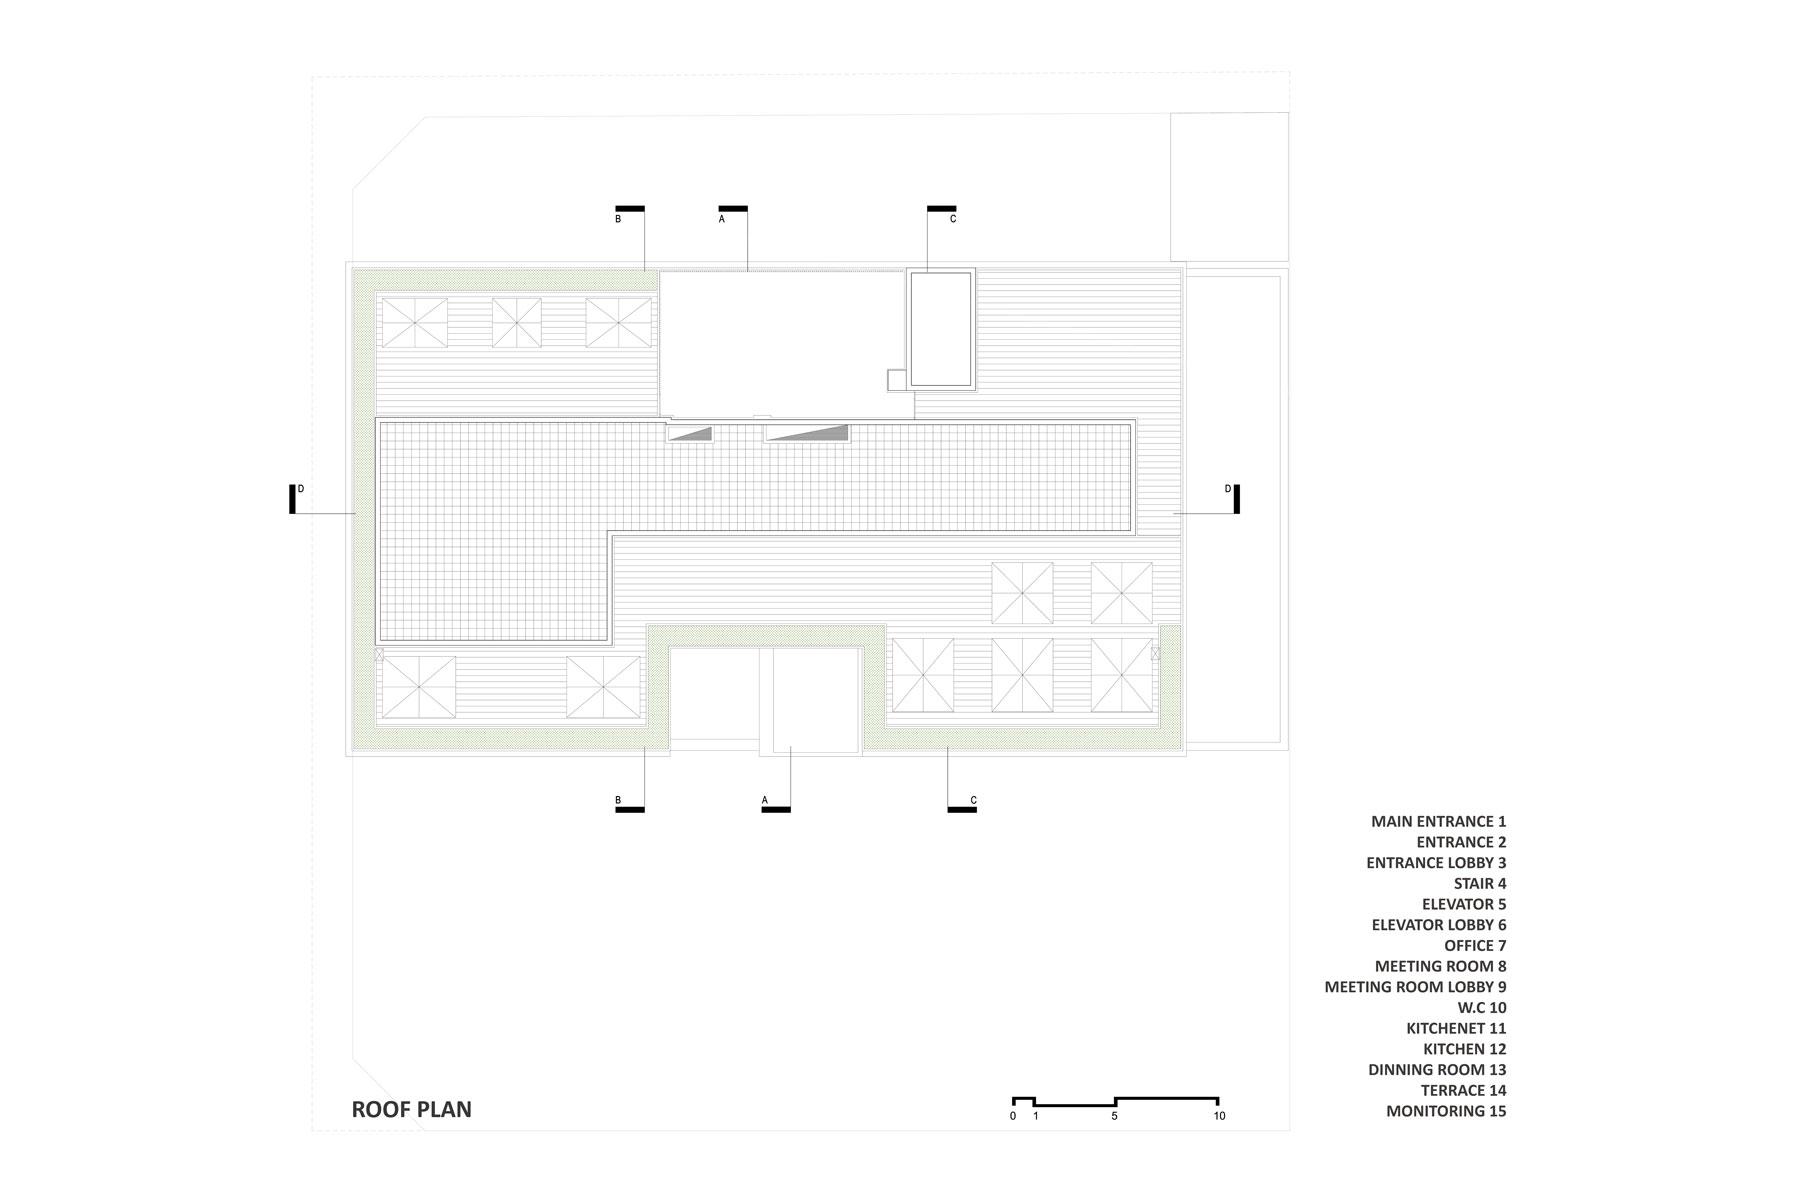 21-EIED Headquarter